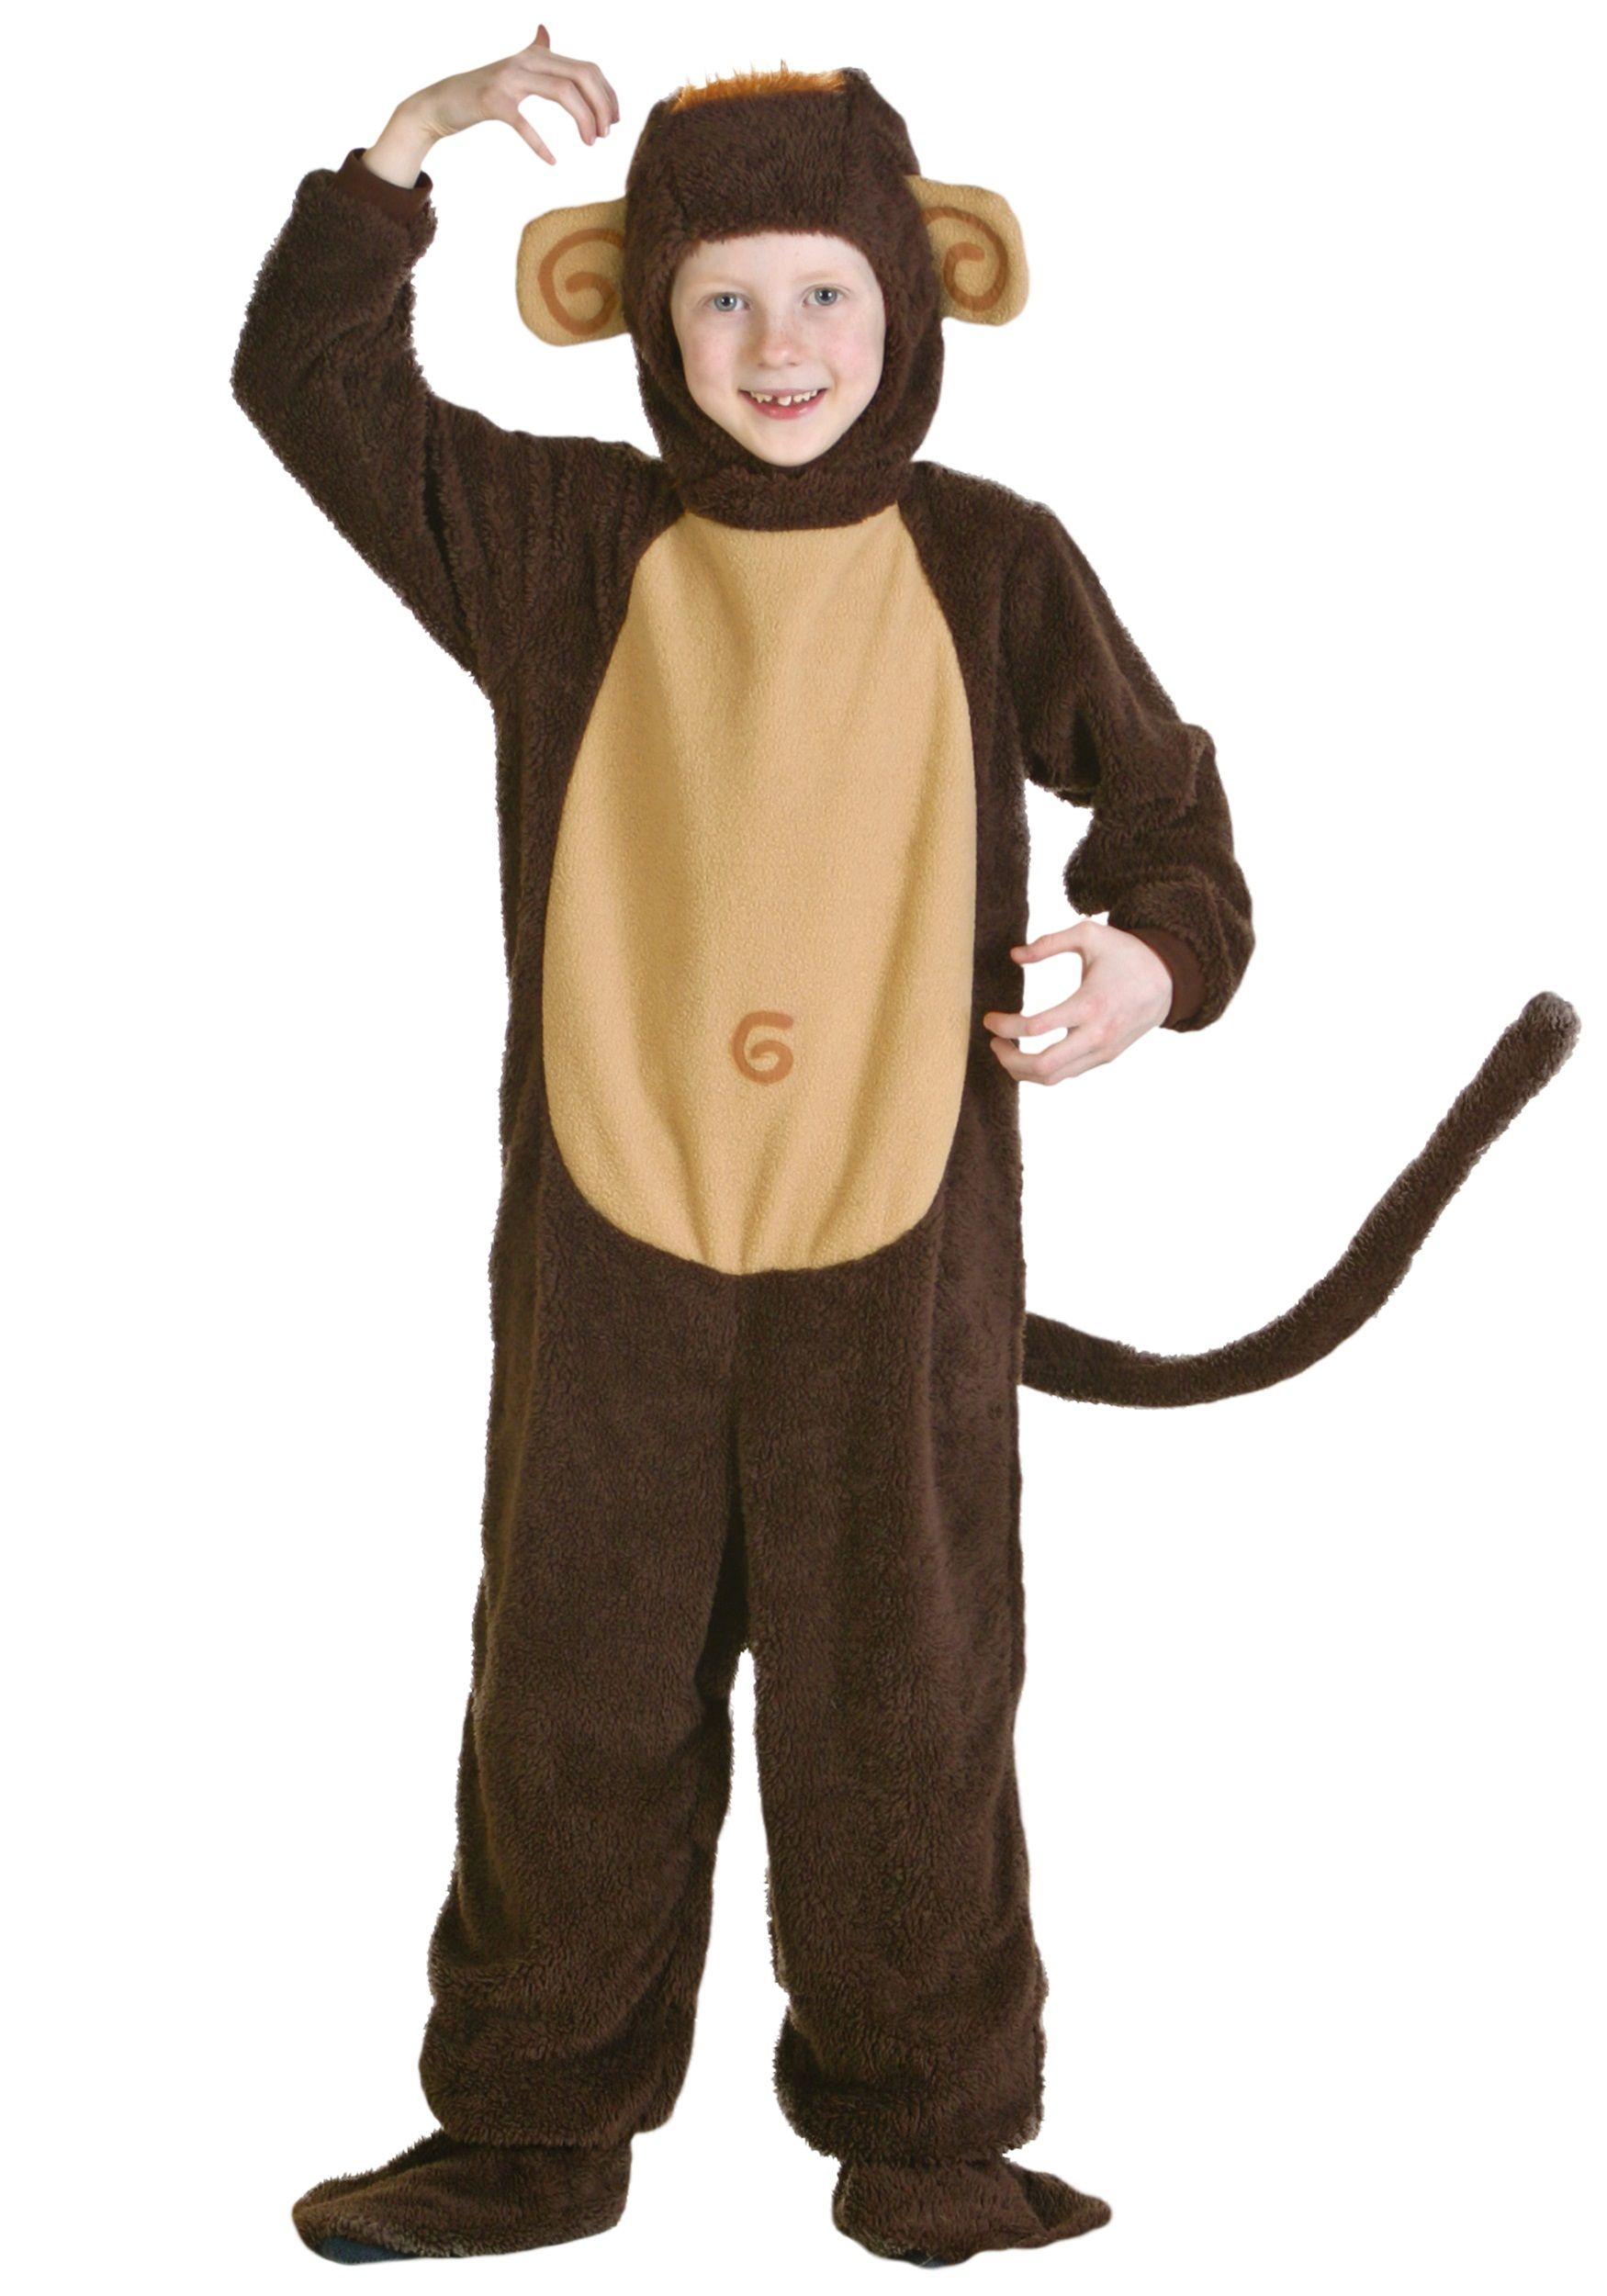 Home Adult Monkey Costume Men Women Couple Pajamas Winter Animal Warm Thick Jumpsuit Halloween Animal Monkey Clothes